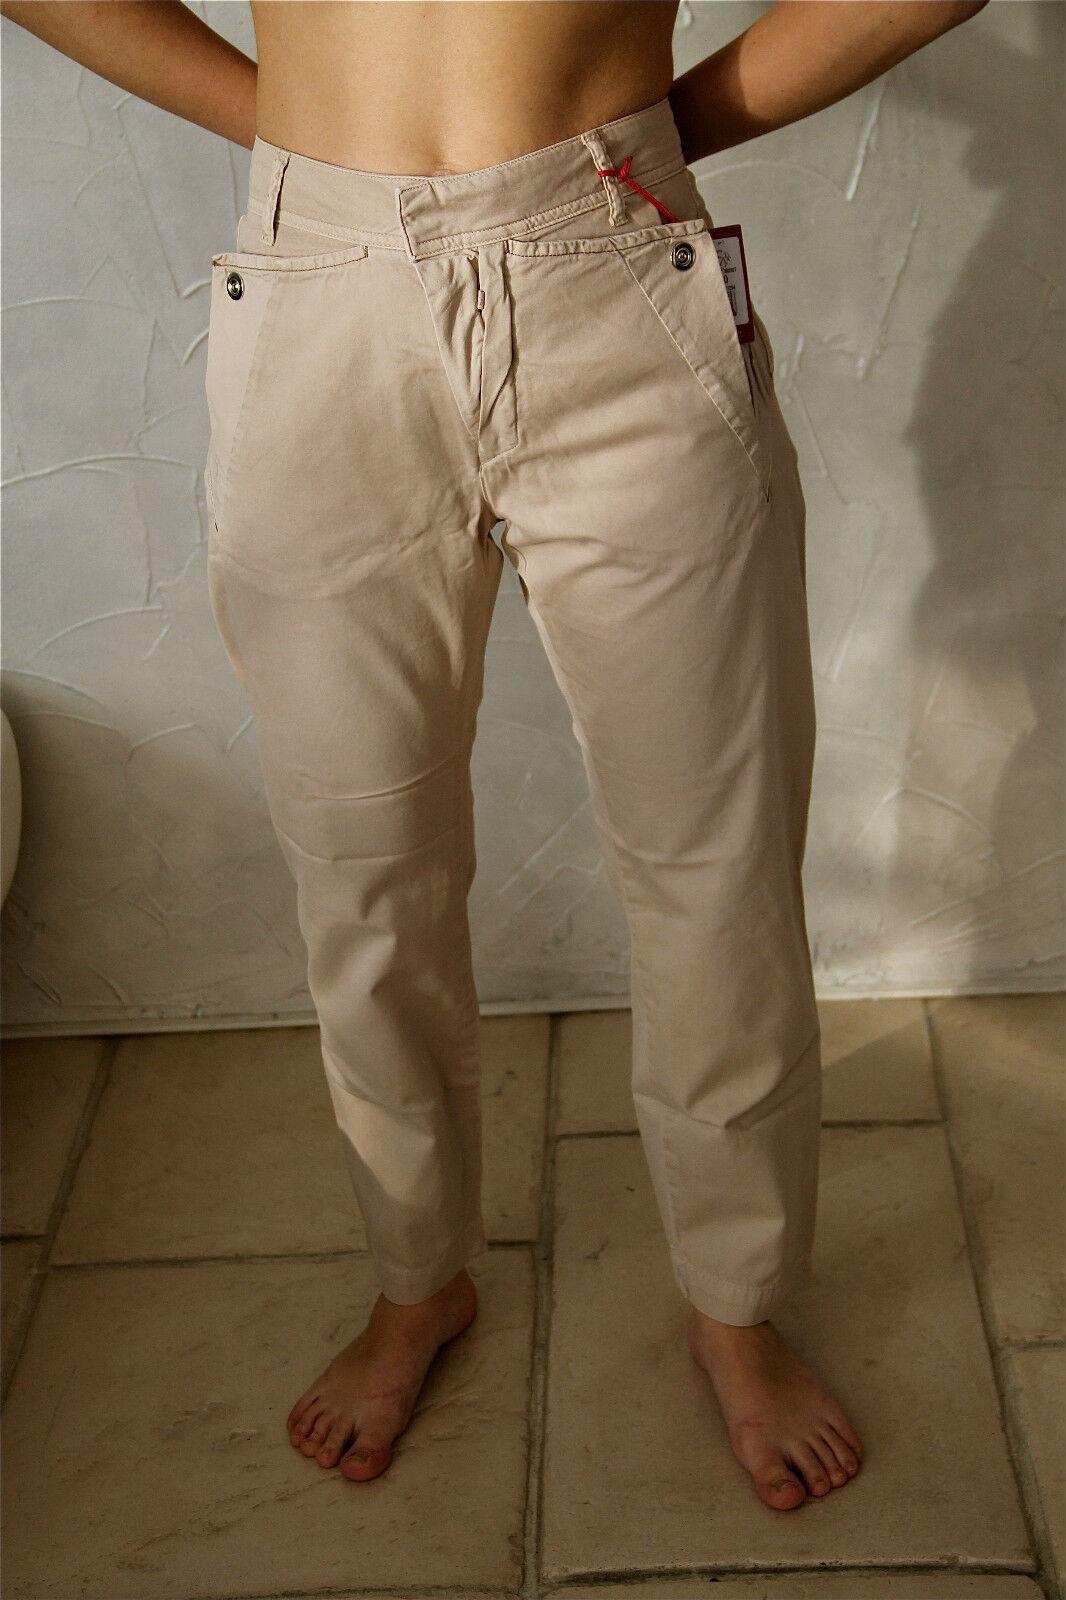 Trousers pantalon safari trek M&F GIRBAUD scoutool T 36 (26) NEUF ÉTIQUETTE